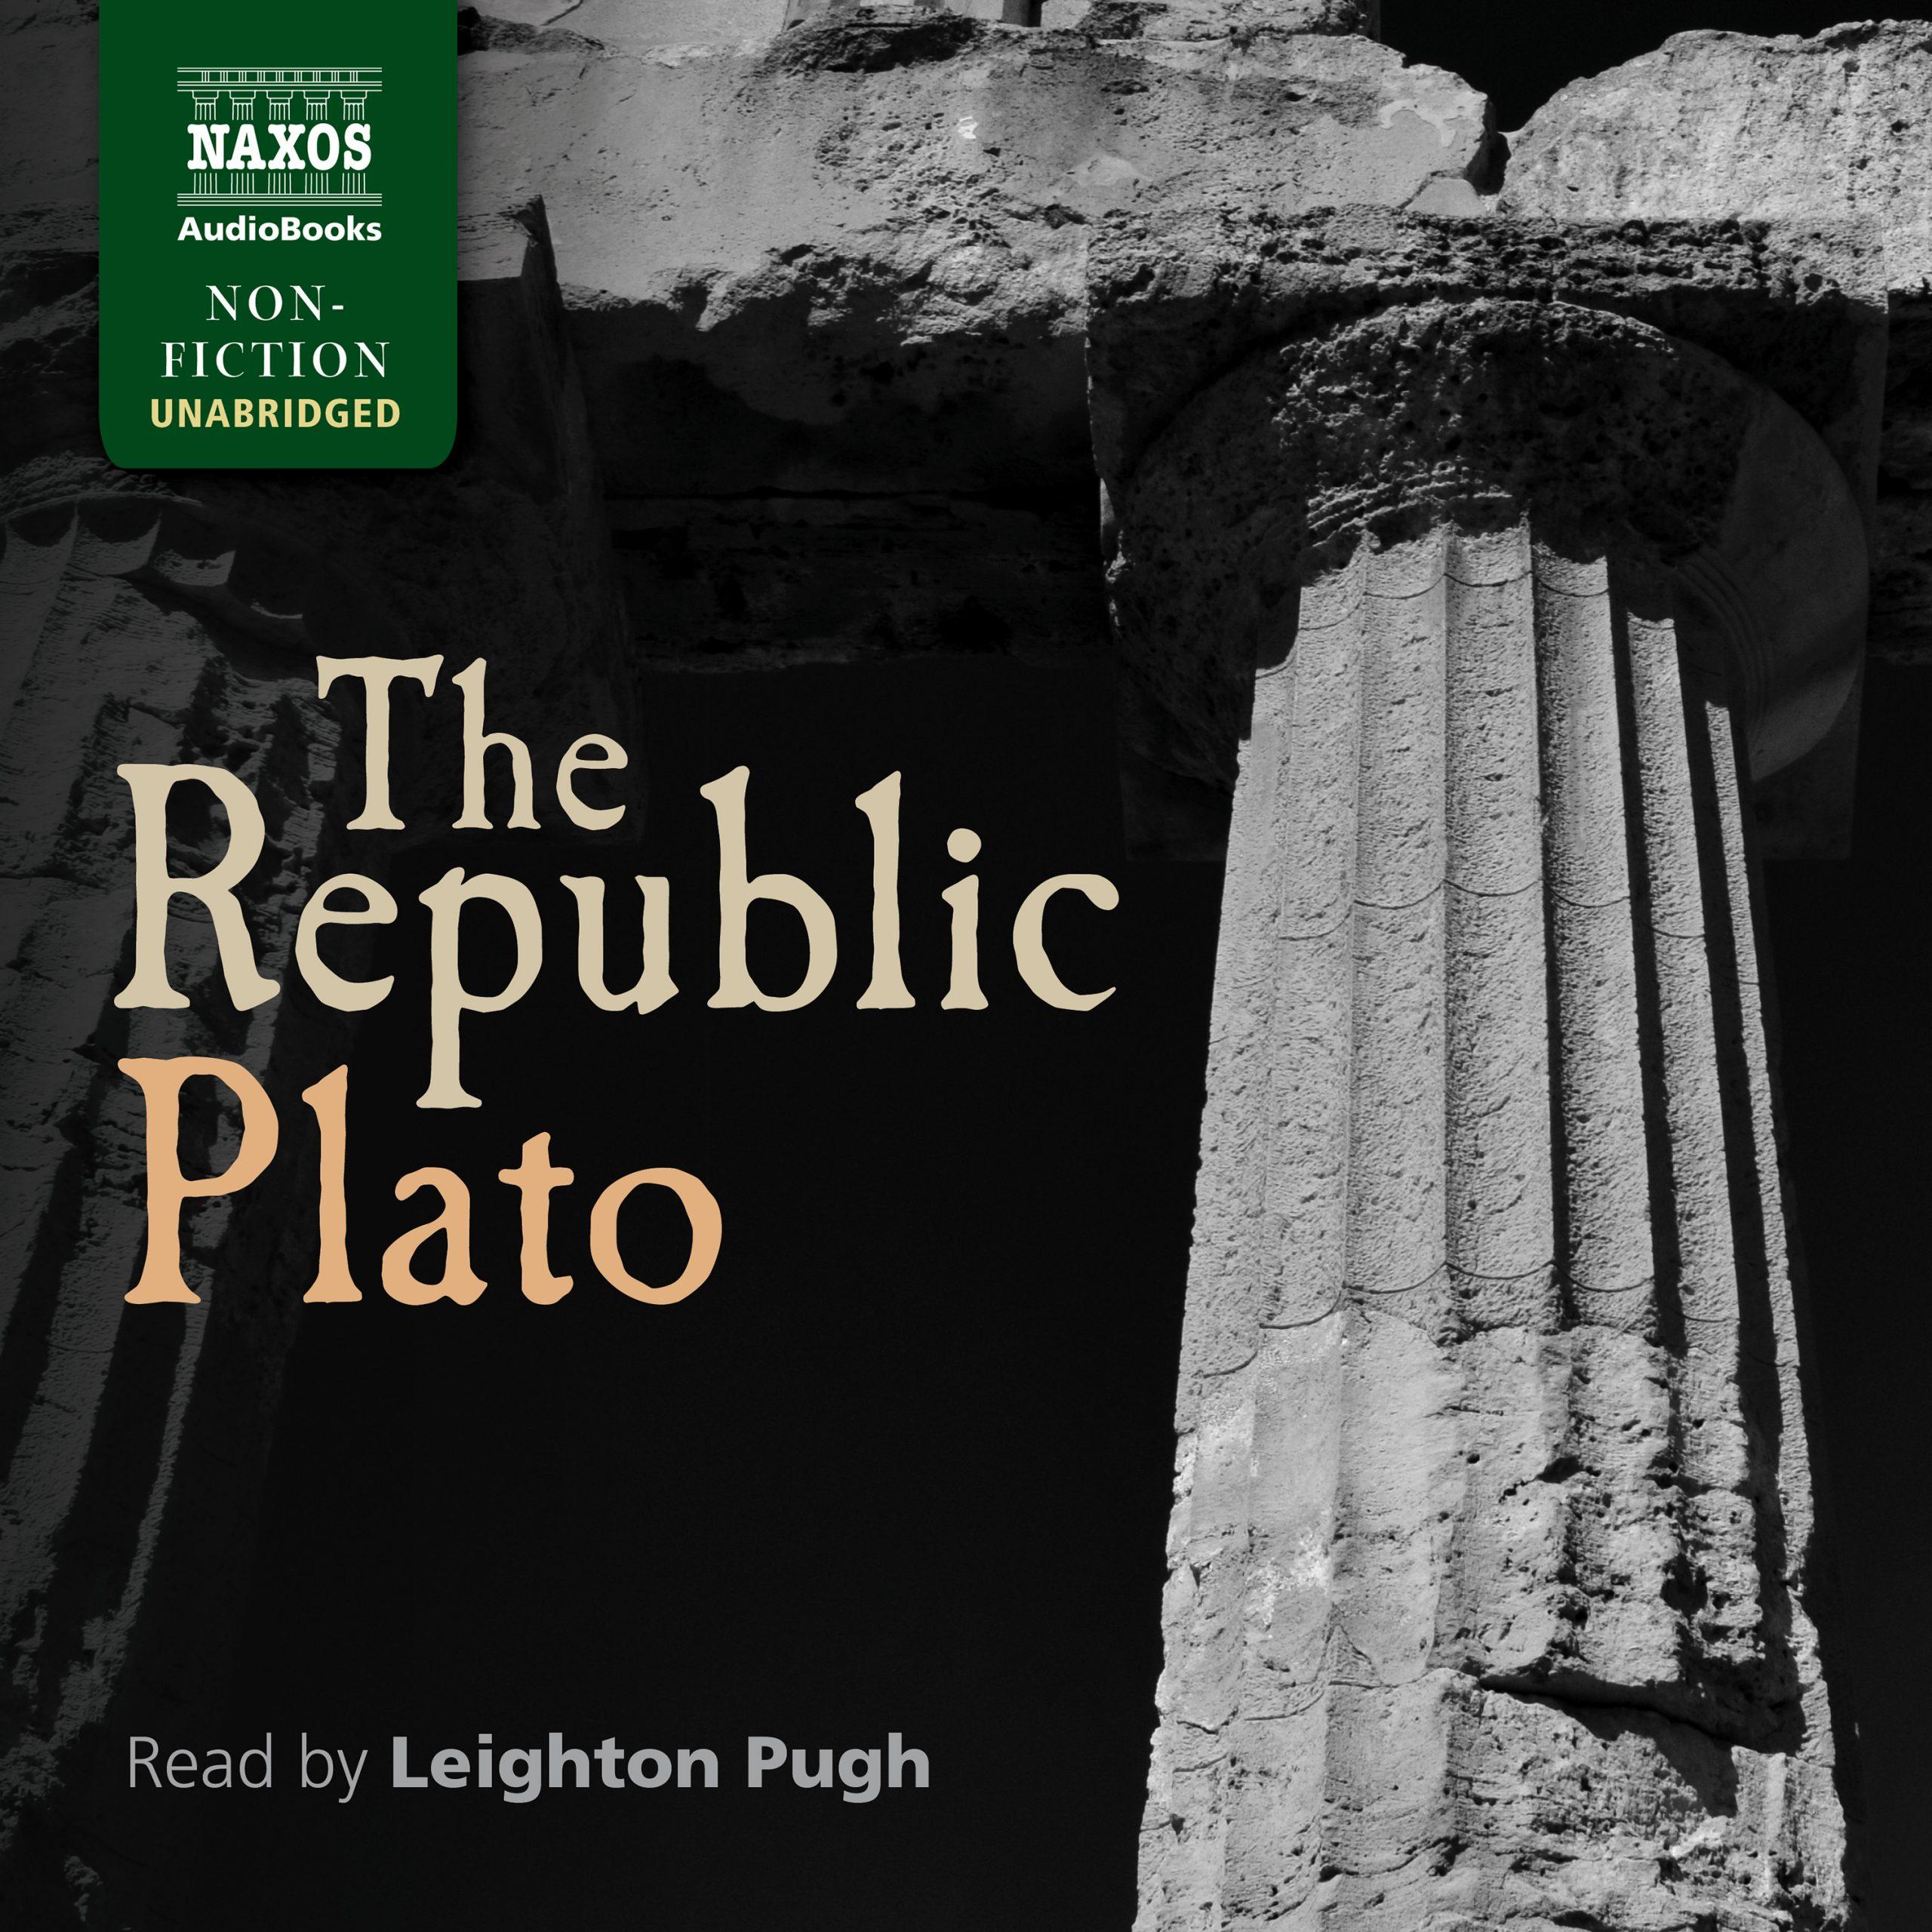 The Republic (unabridged)